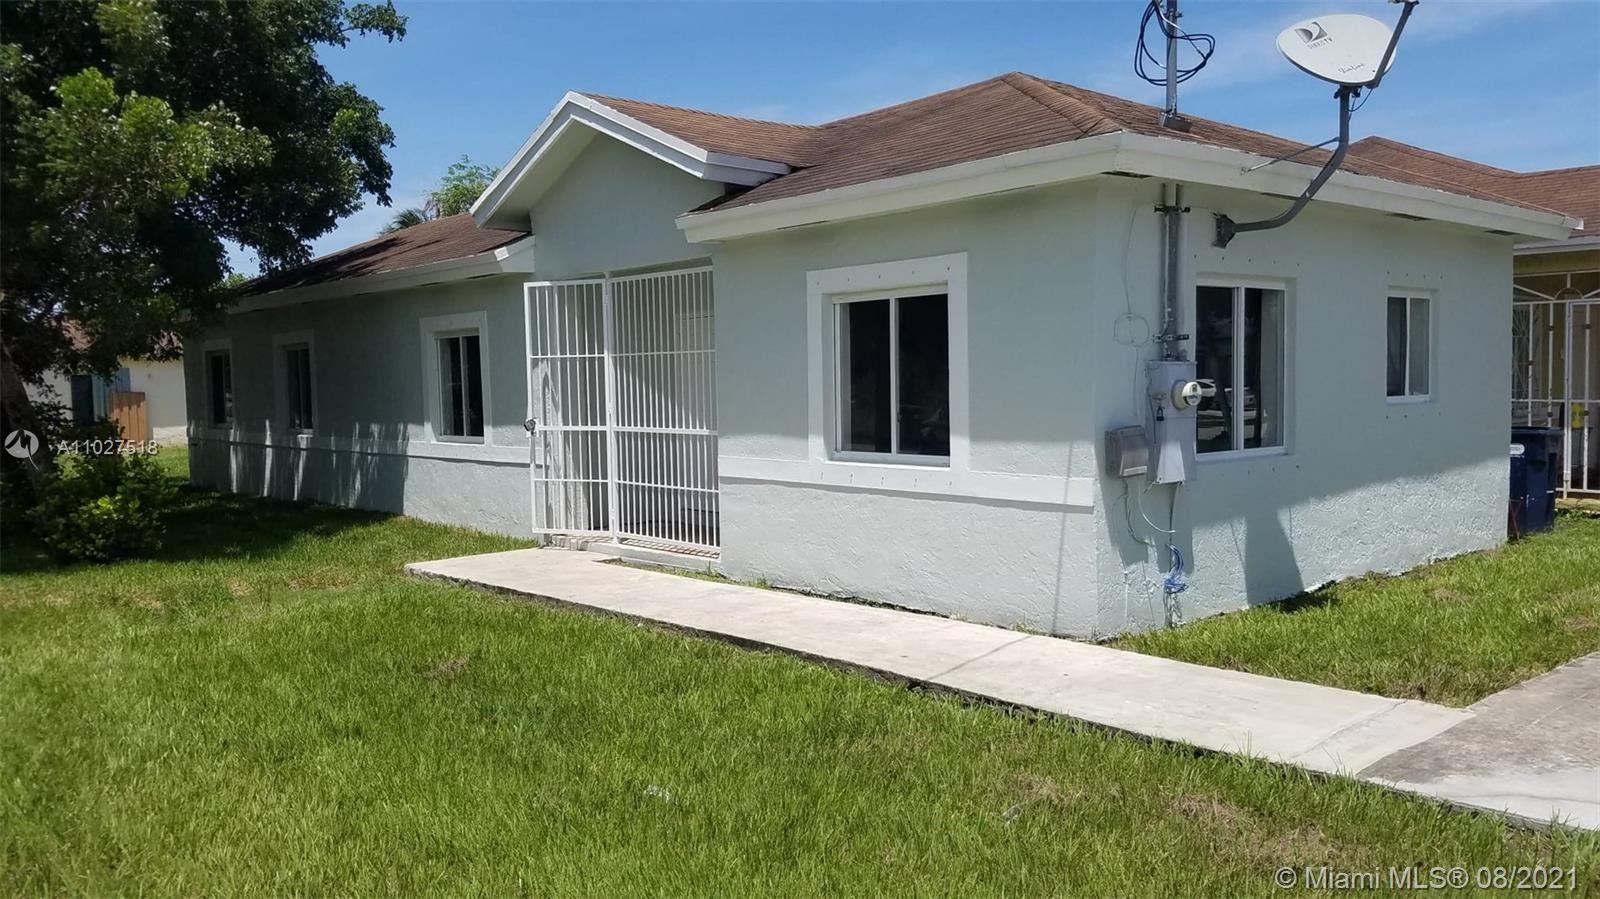 22091 SW 122nd Ave, Miami, FL 33170 - #: A11027518